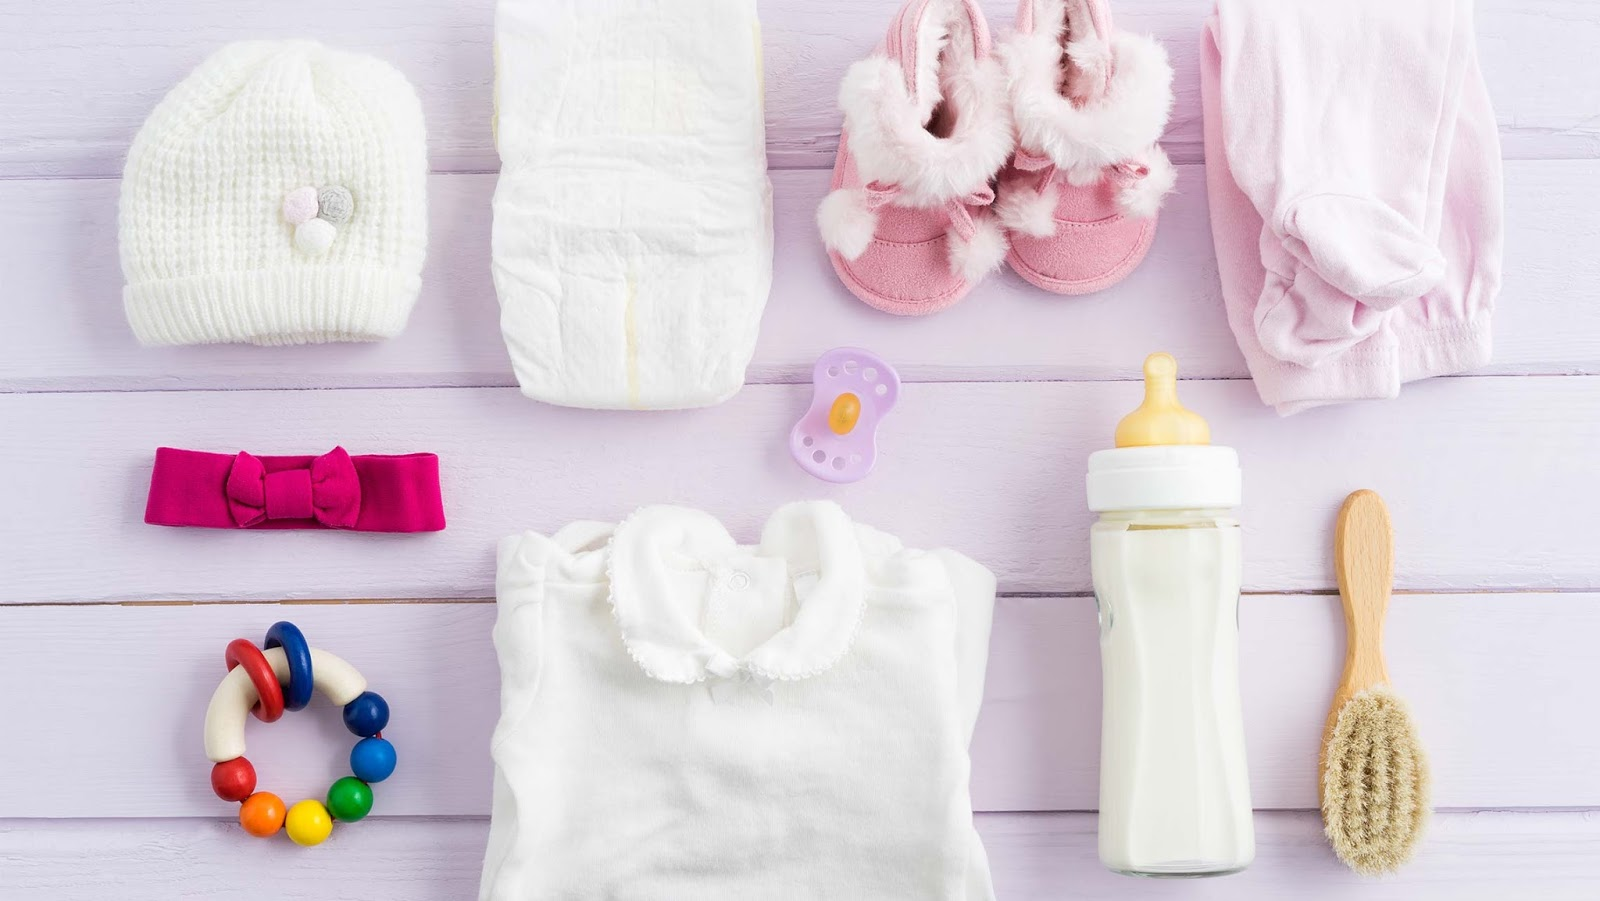 checkliste baby erstausstattung beauty mami. Black Bedroom Furniture Sets. Home Design Ideas